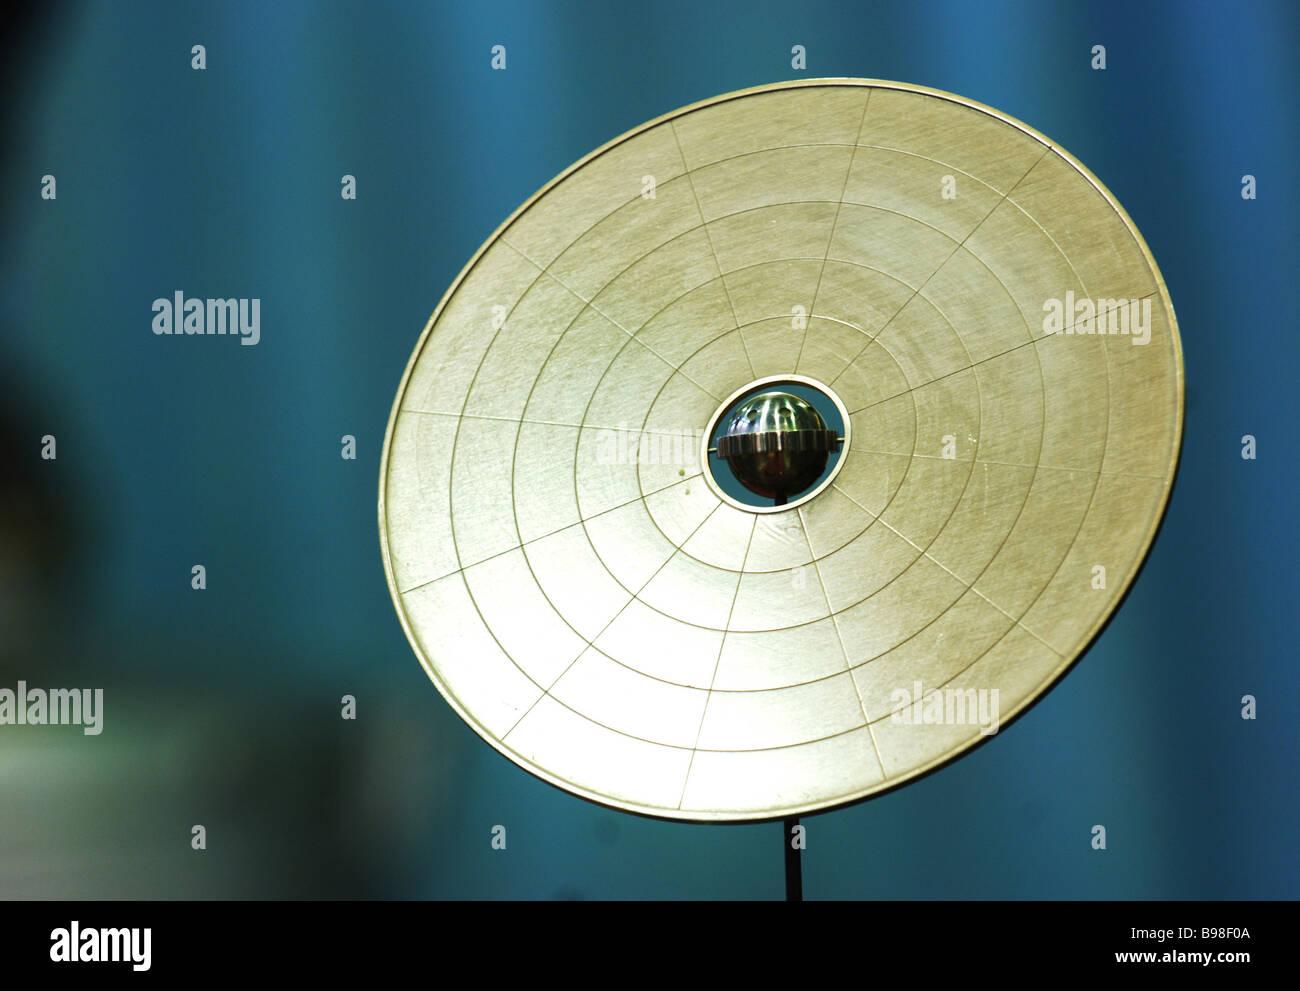 The interplanetary spacecraft Gelioraketoplan Valentin Glushko s graduation project is displayed at the Glushko - Stock Image